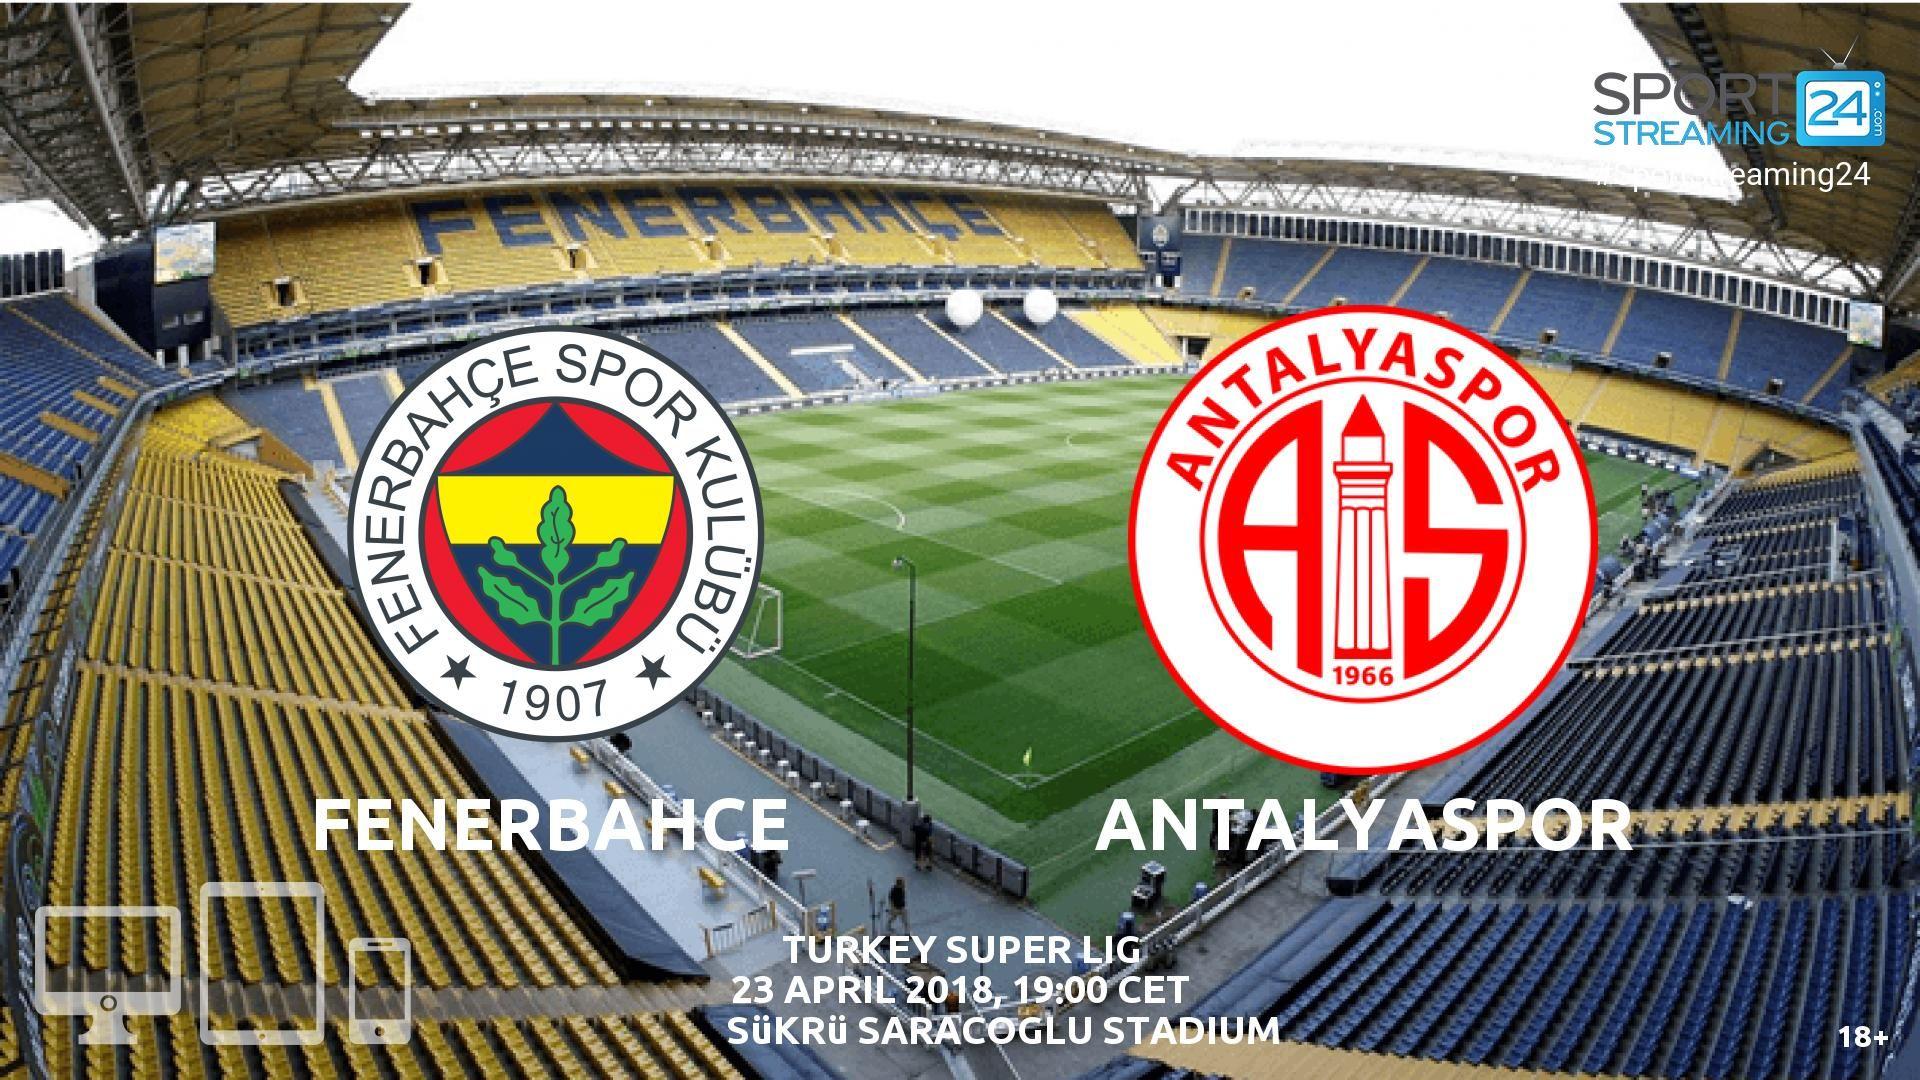 Fenerbahce v Antalyaspor Live Streaming Football